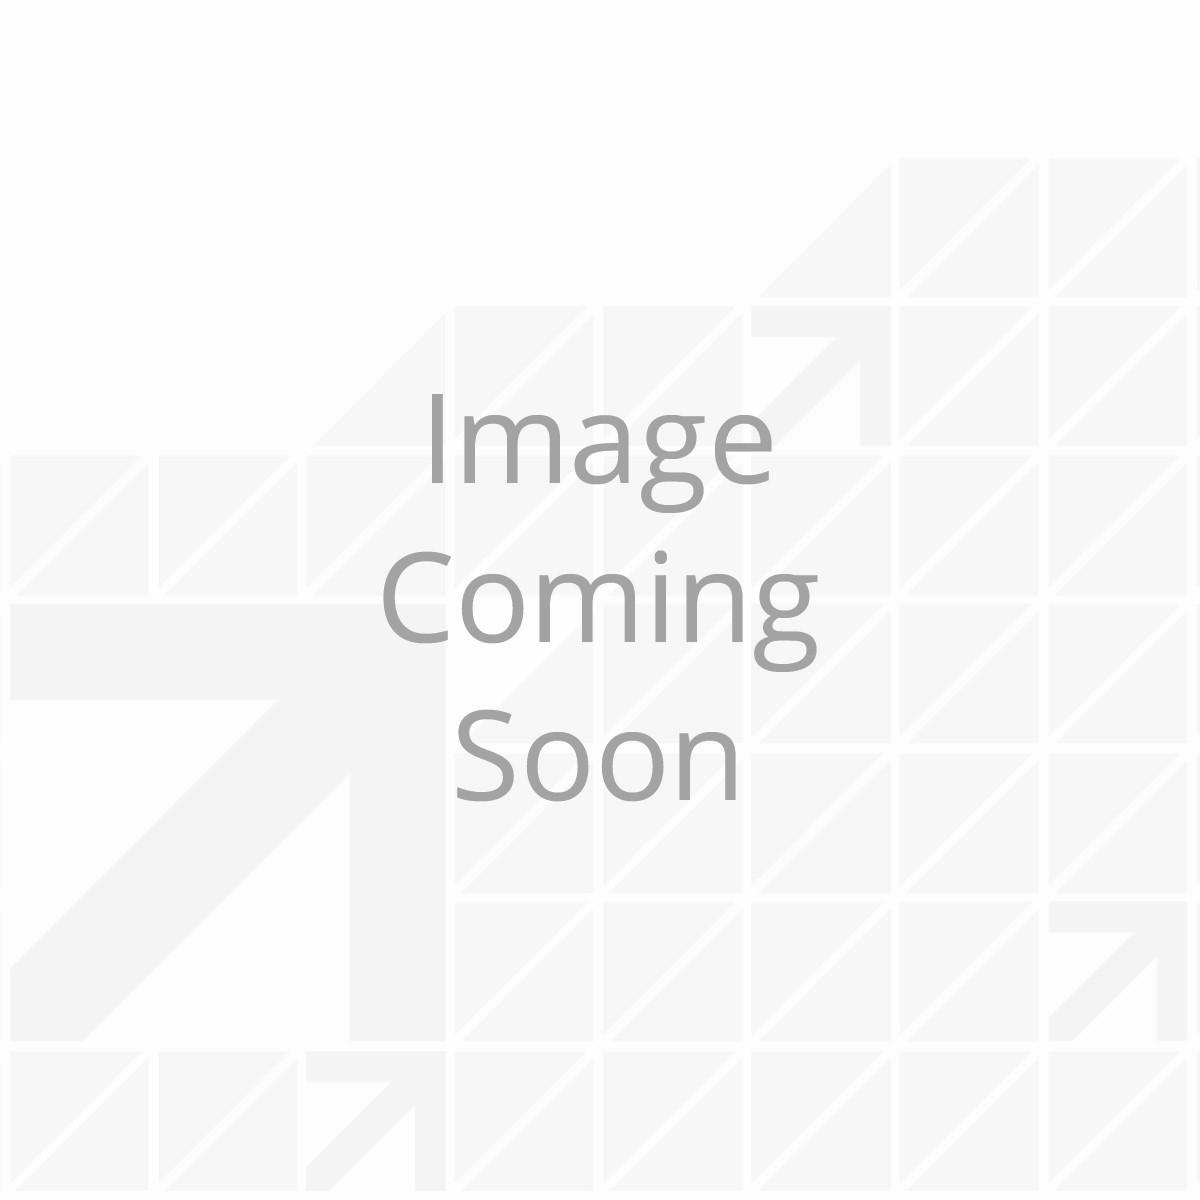 30A 125/250V Transfer Switch